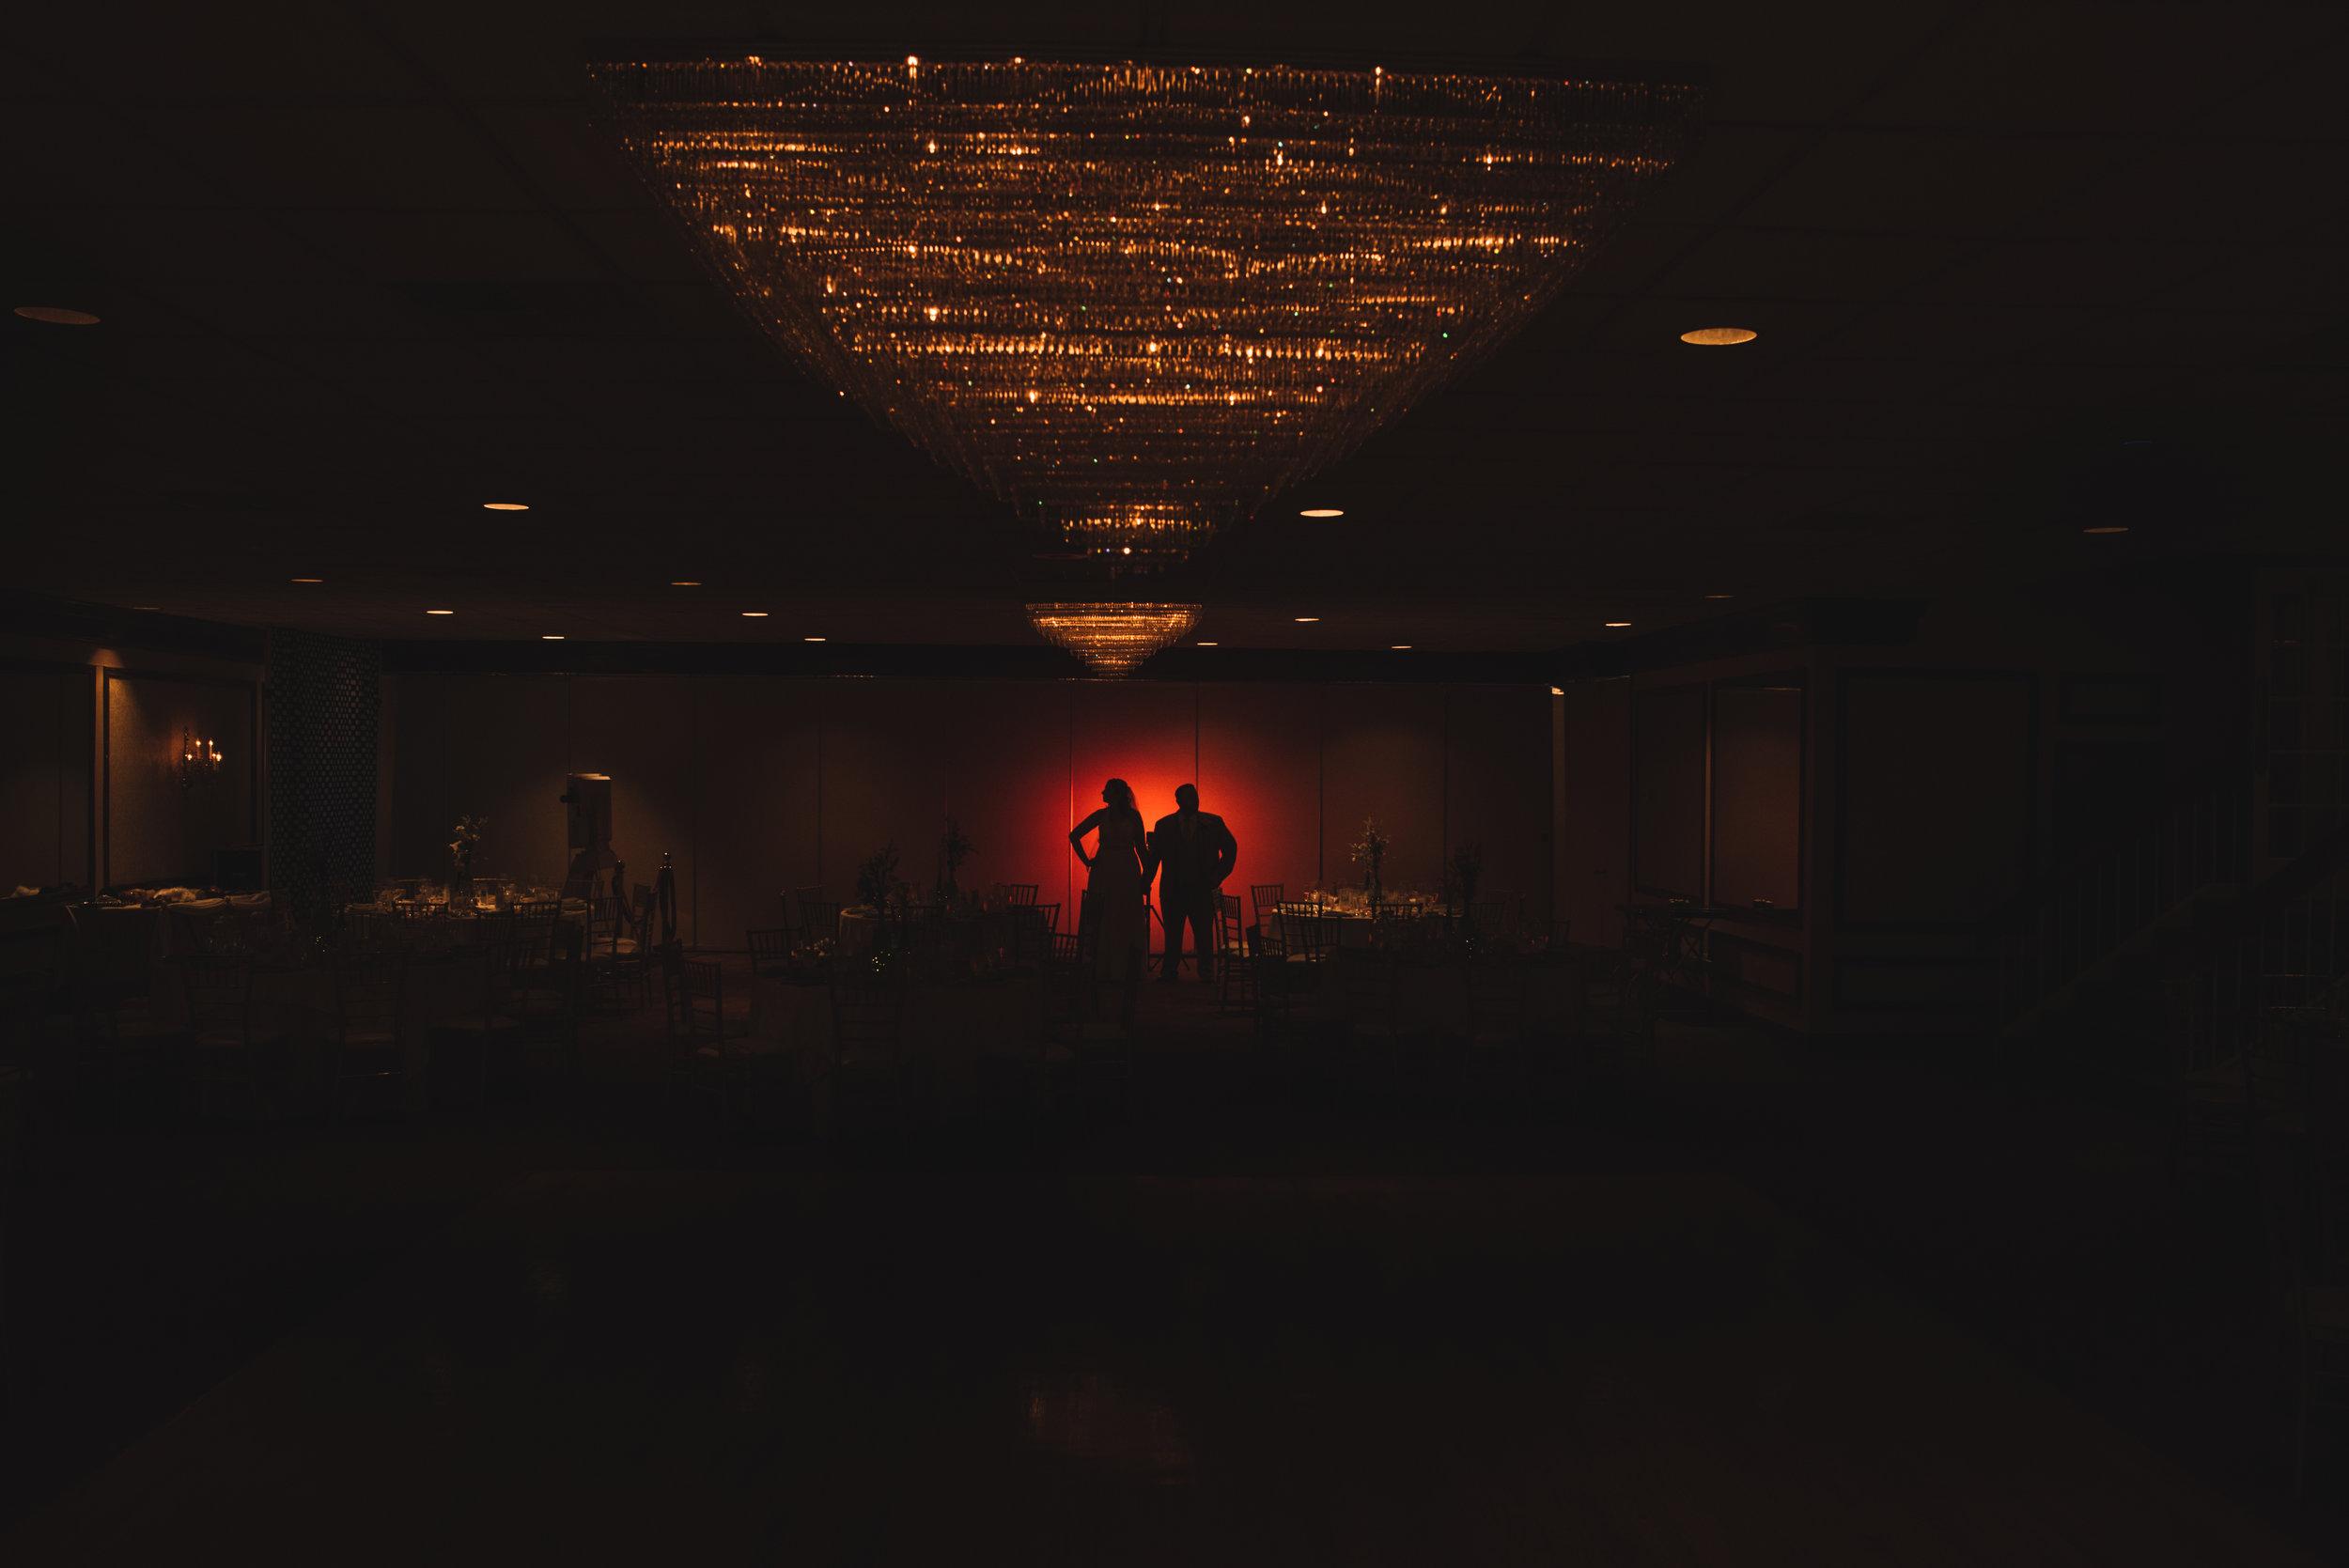 WeddingPhotos | NJPhotographer | Highlights-4-3.jpg